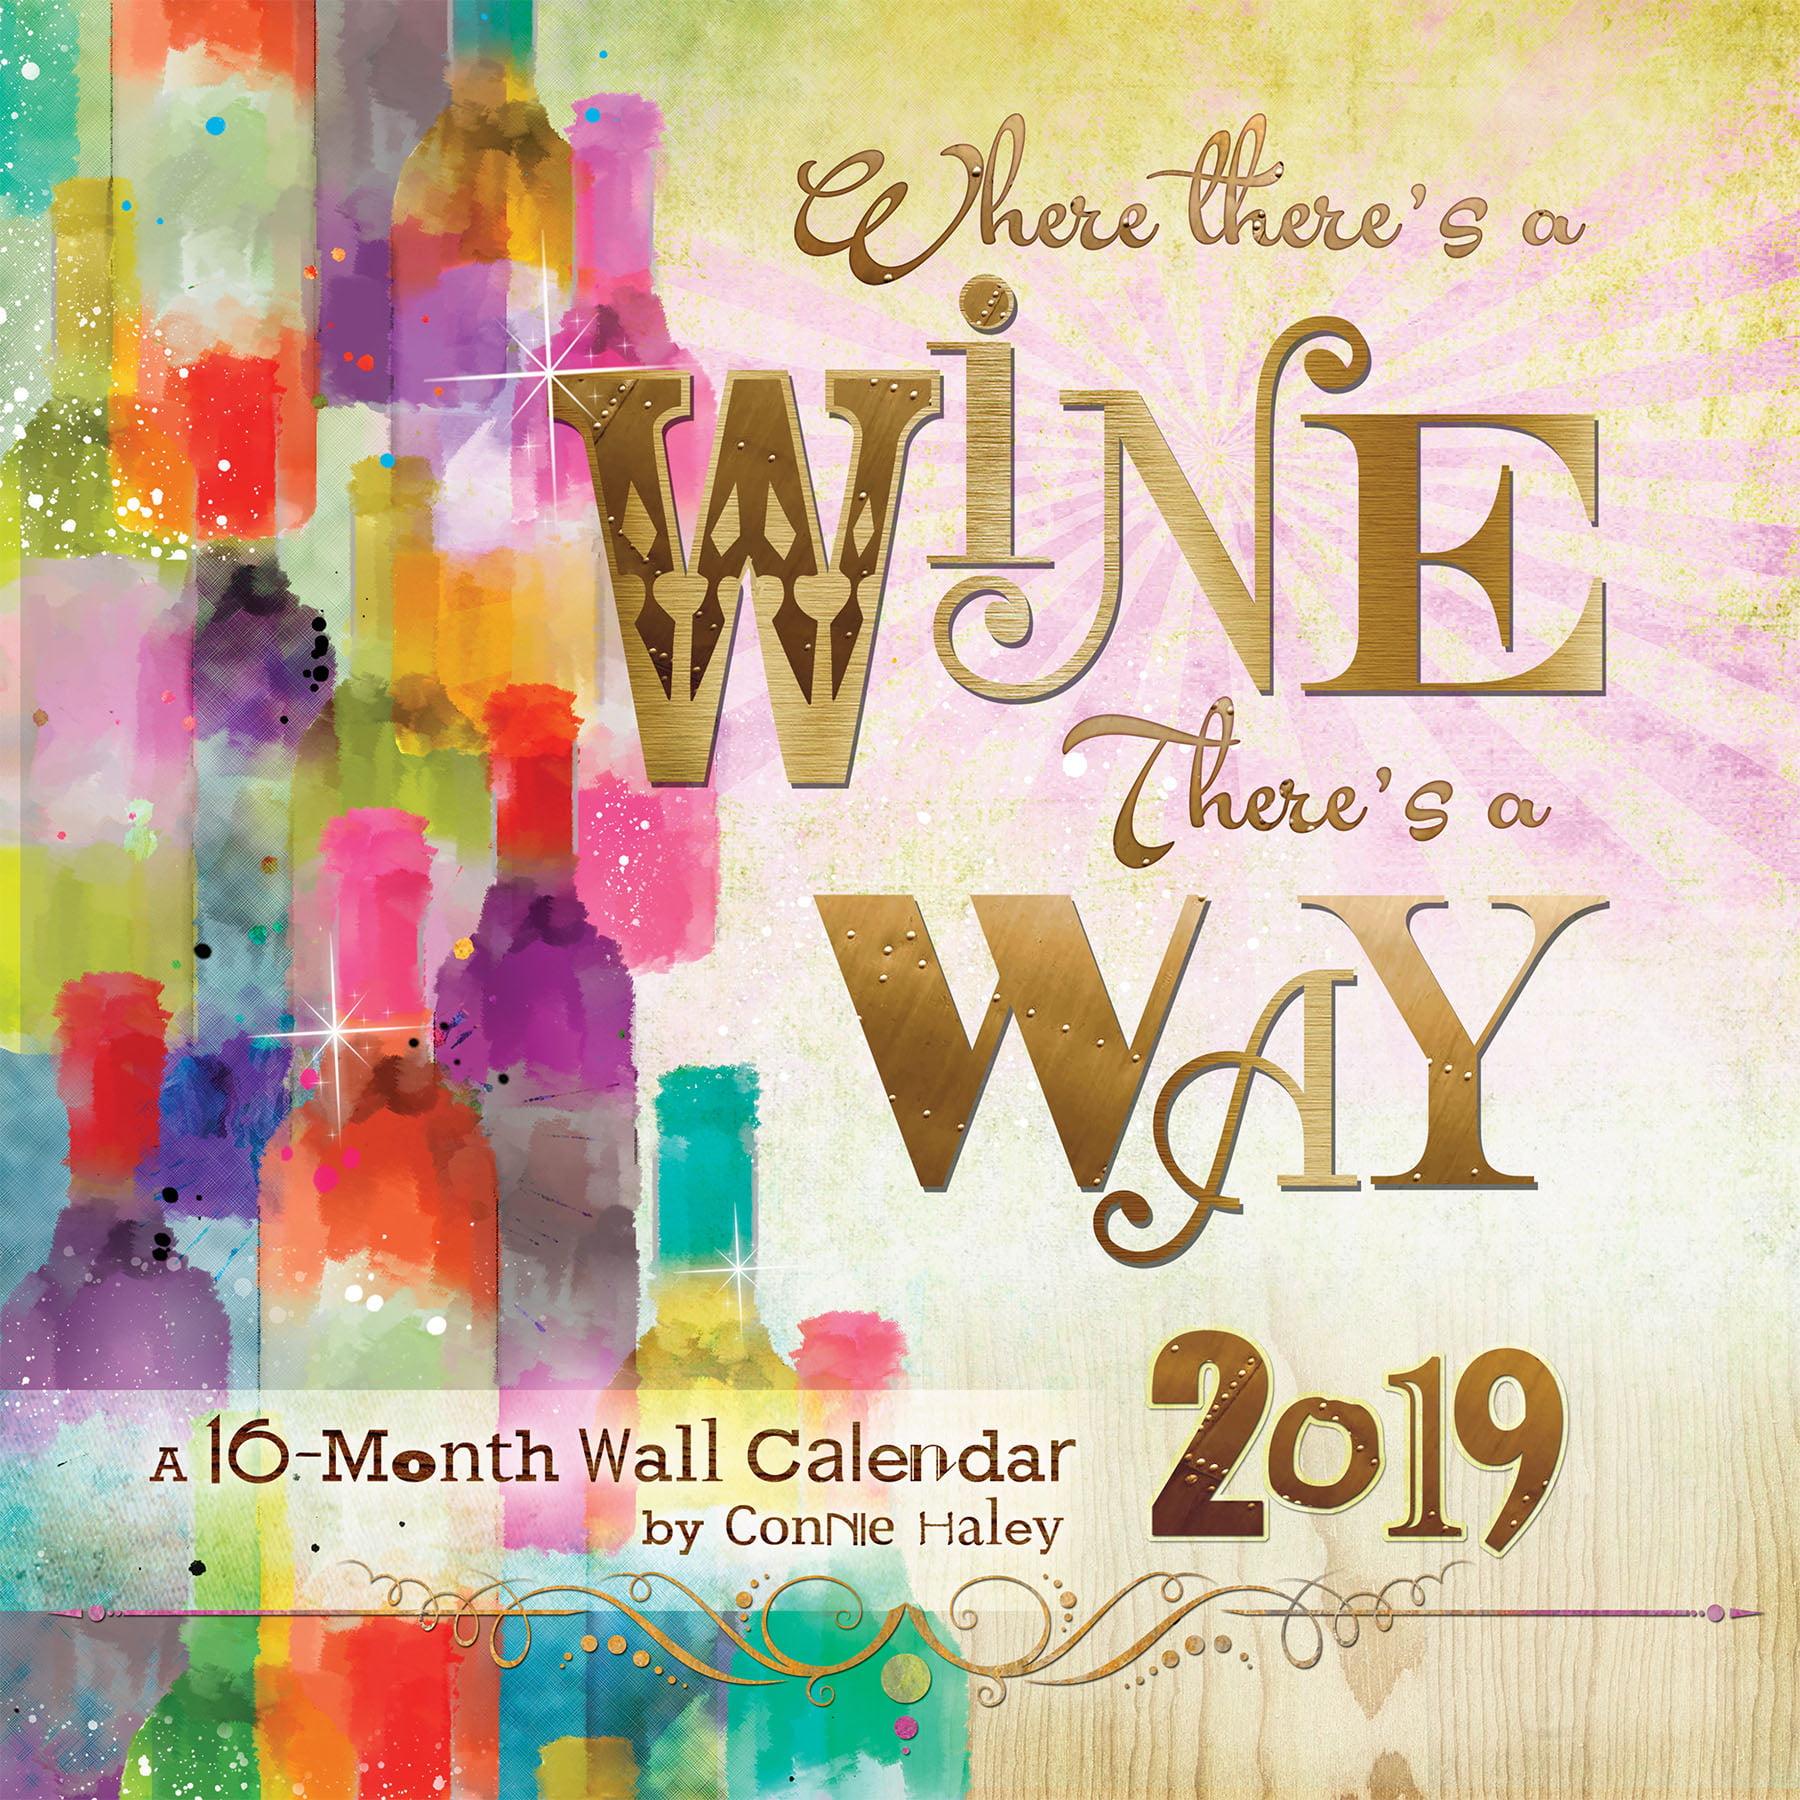 2019 Wine � Connie Haley Wall Calendar by Trends International